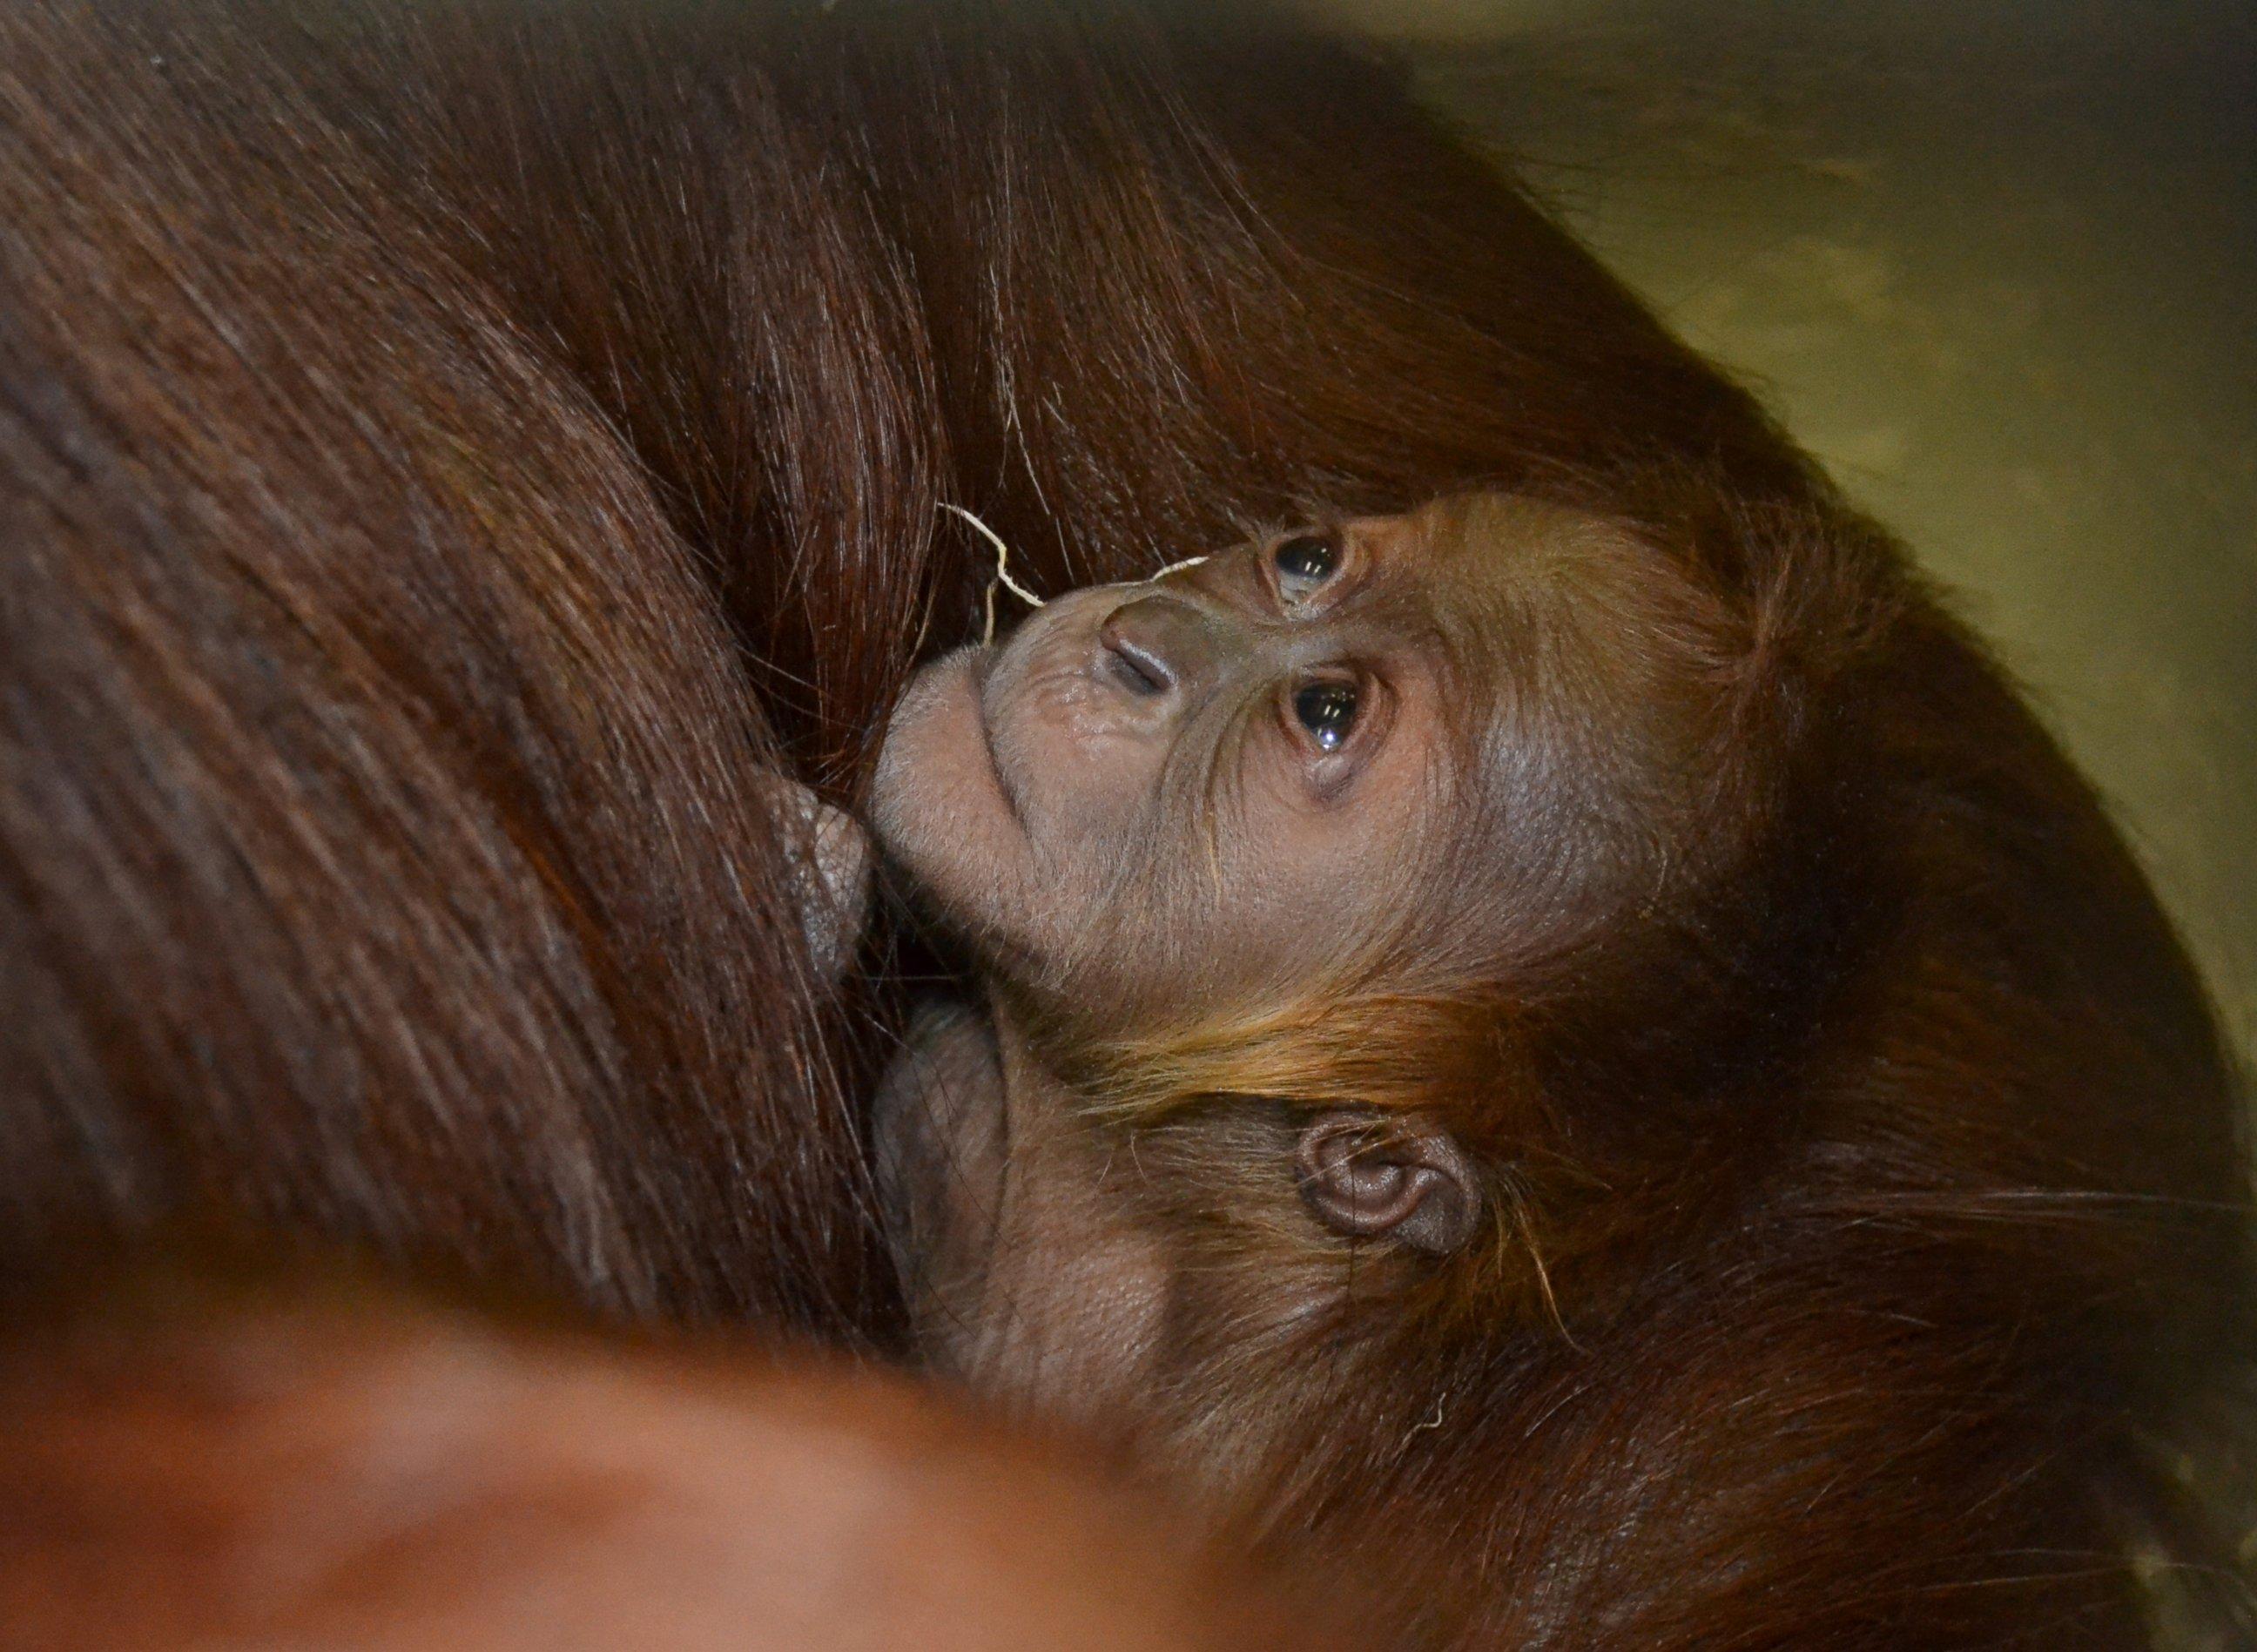 Mother and Baby Orangutan Bond